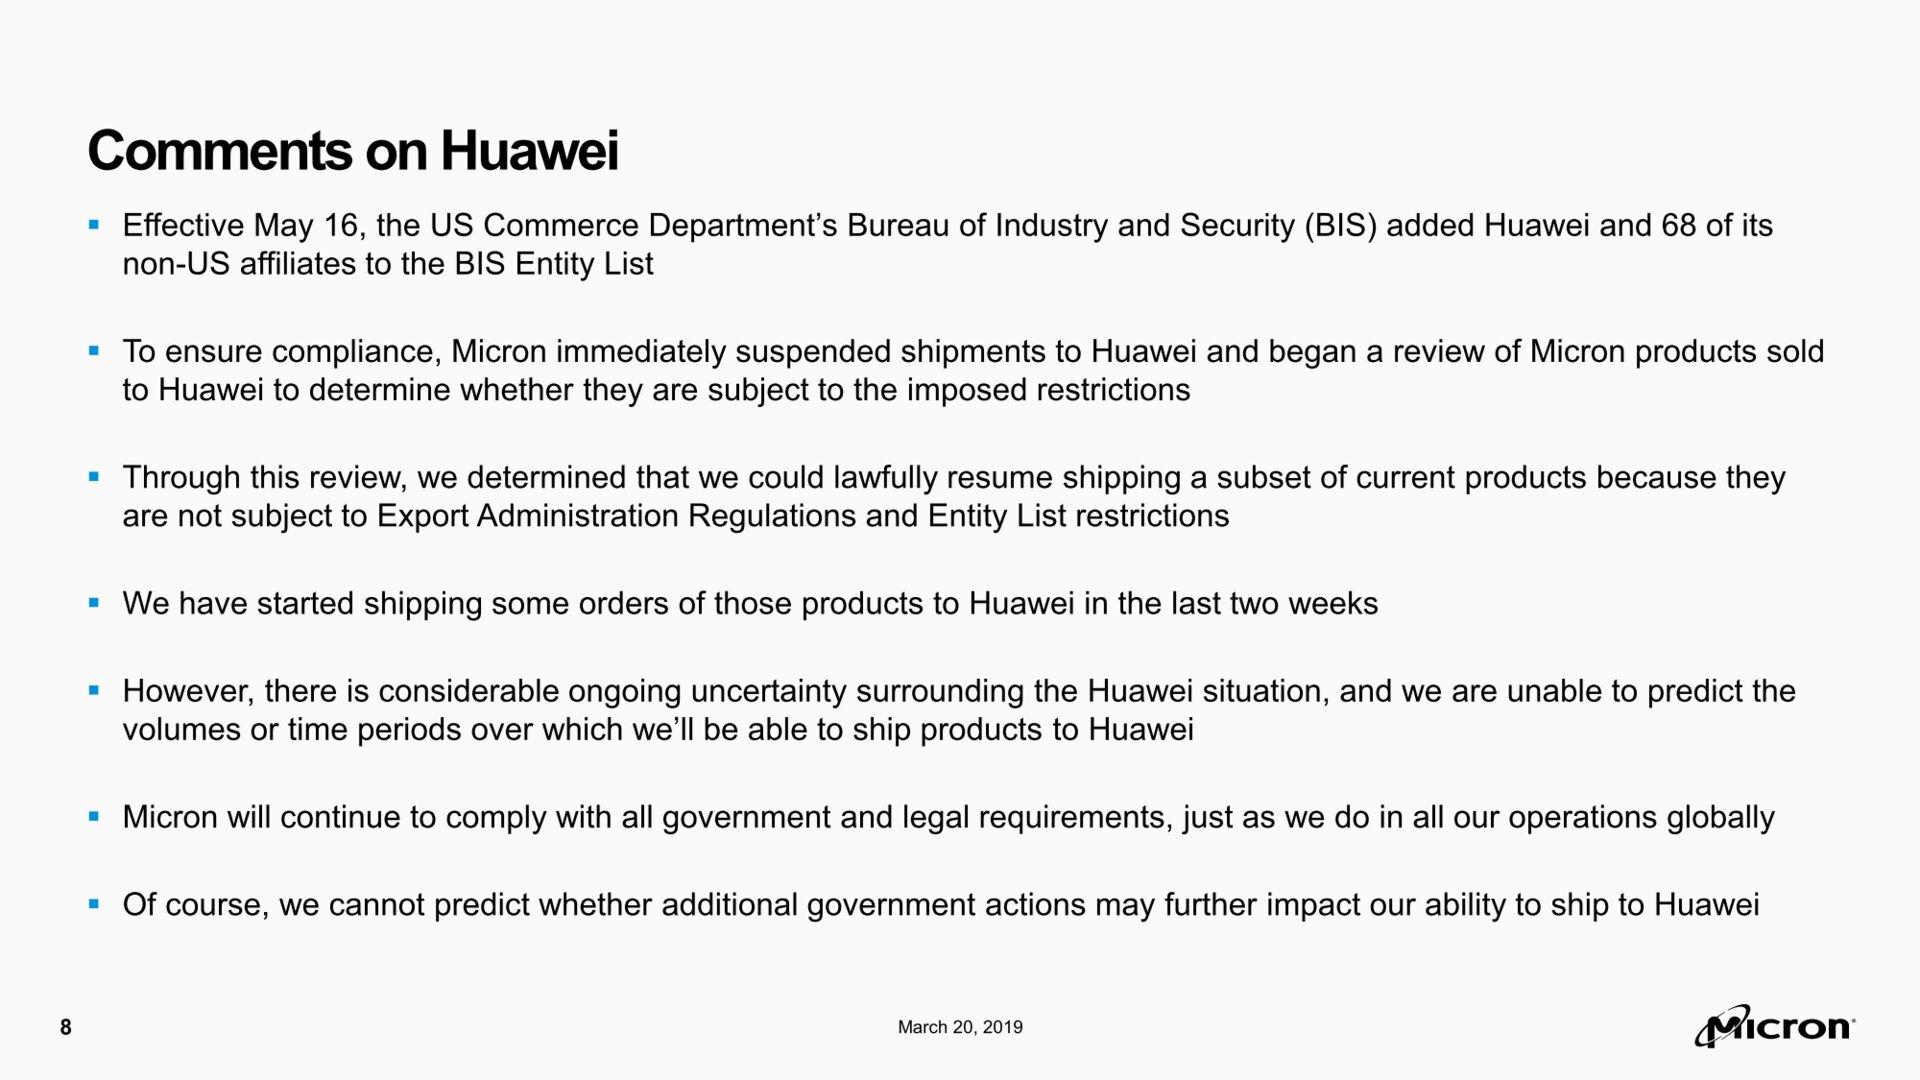 Microns Statement zur Situation mit Huawei